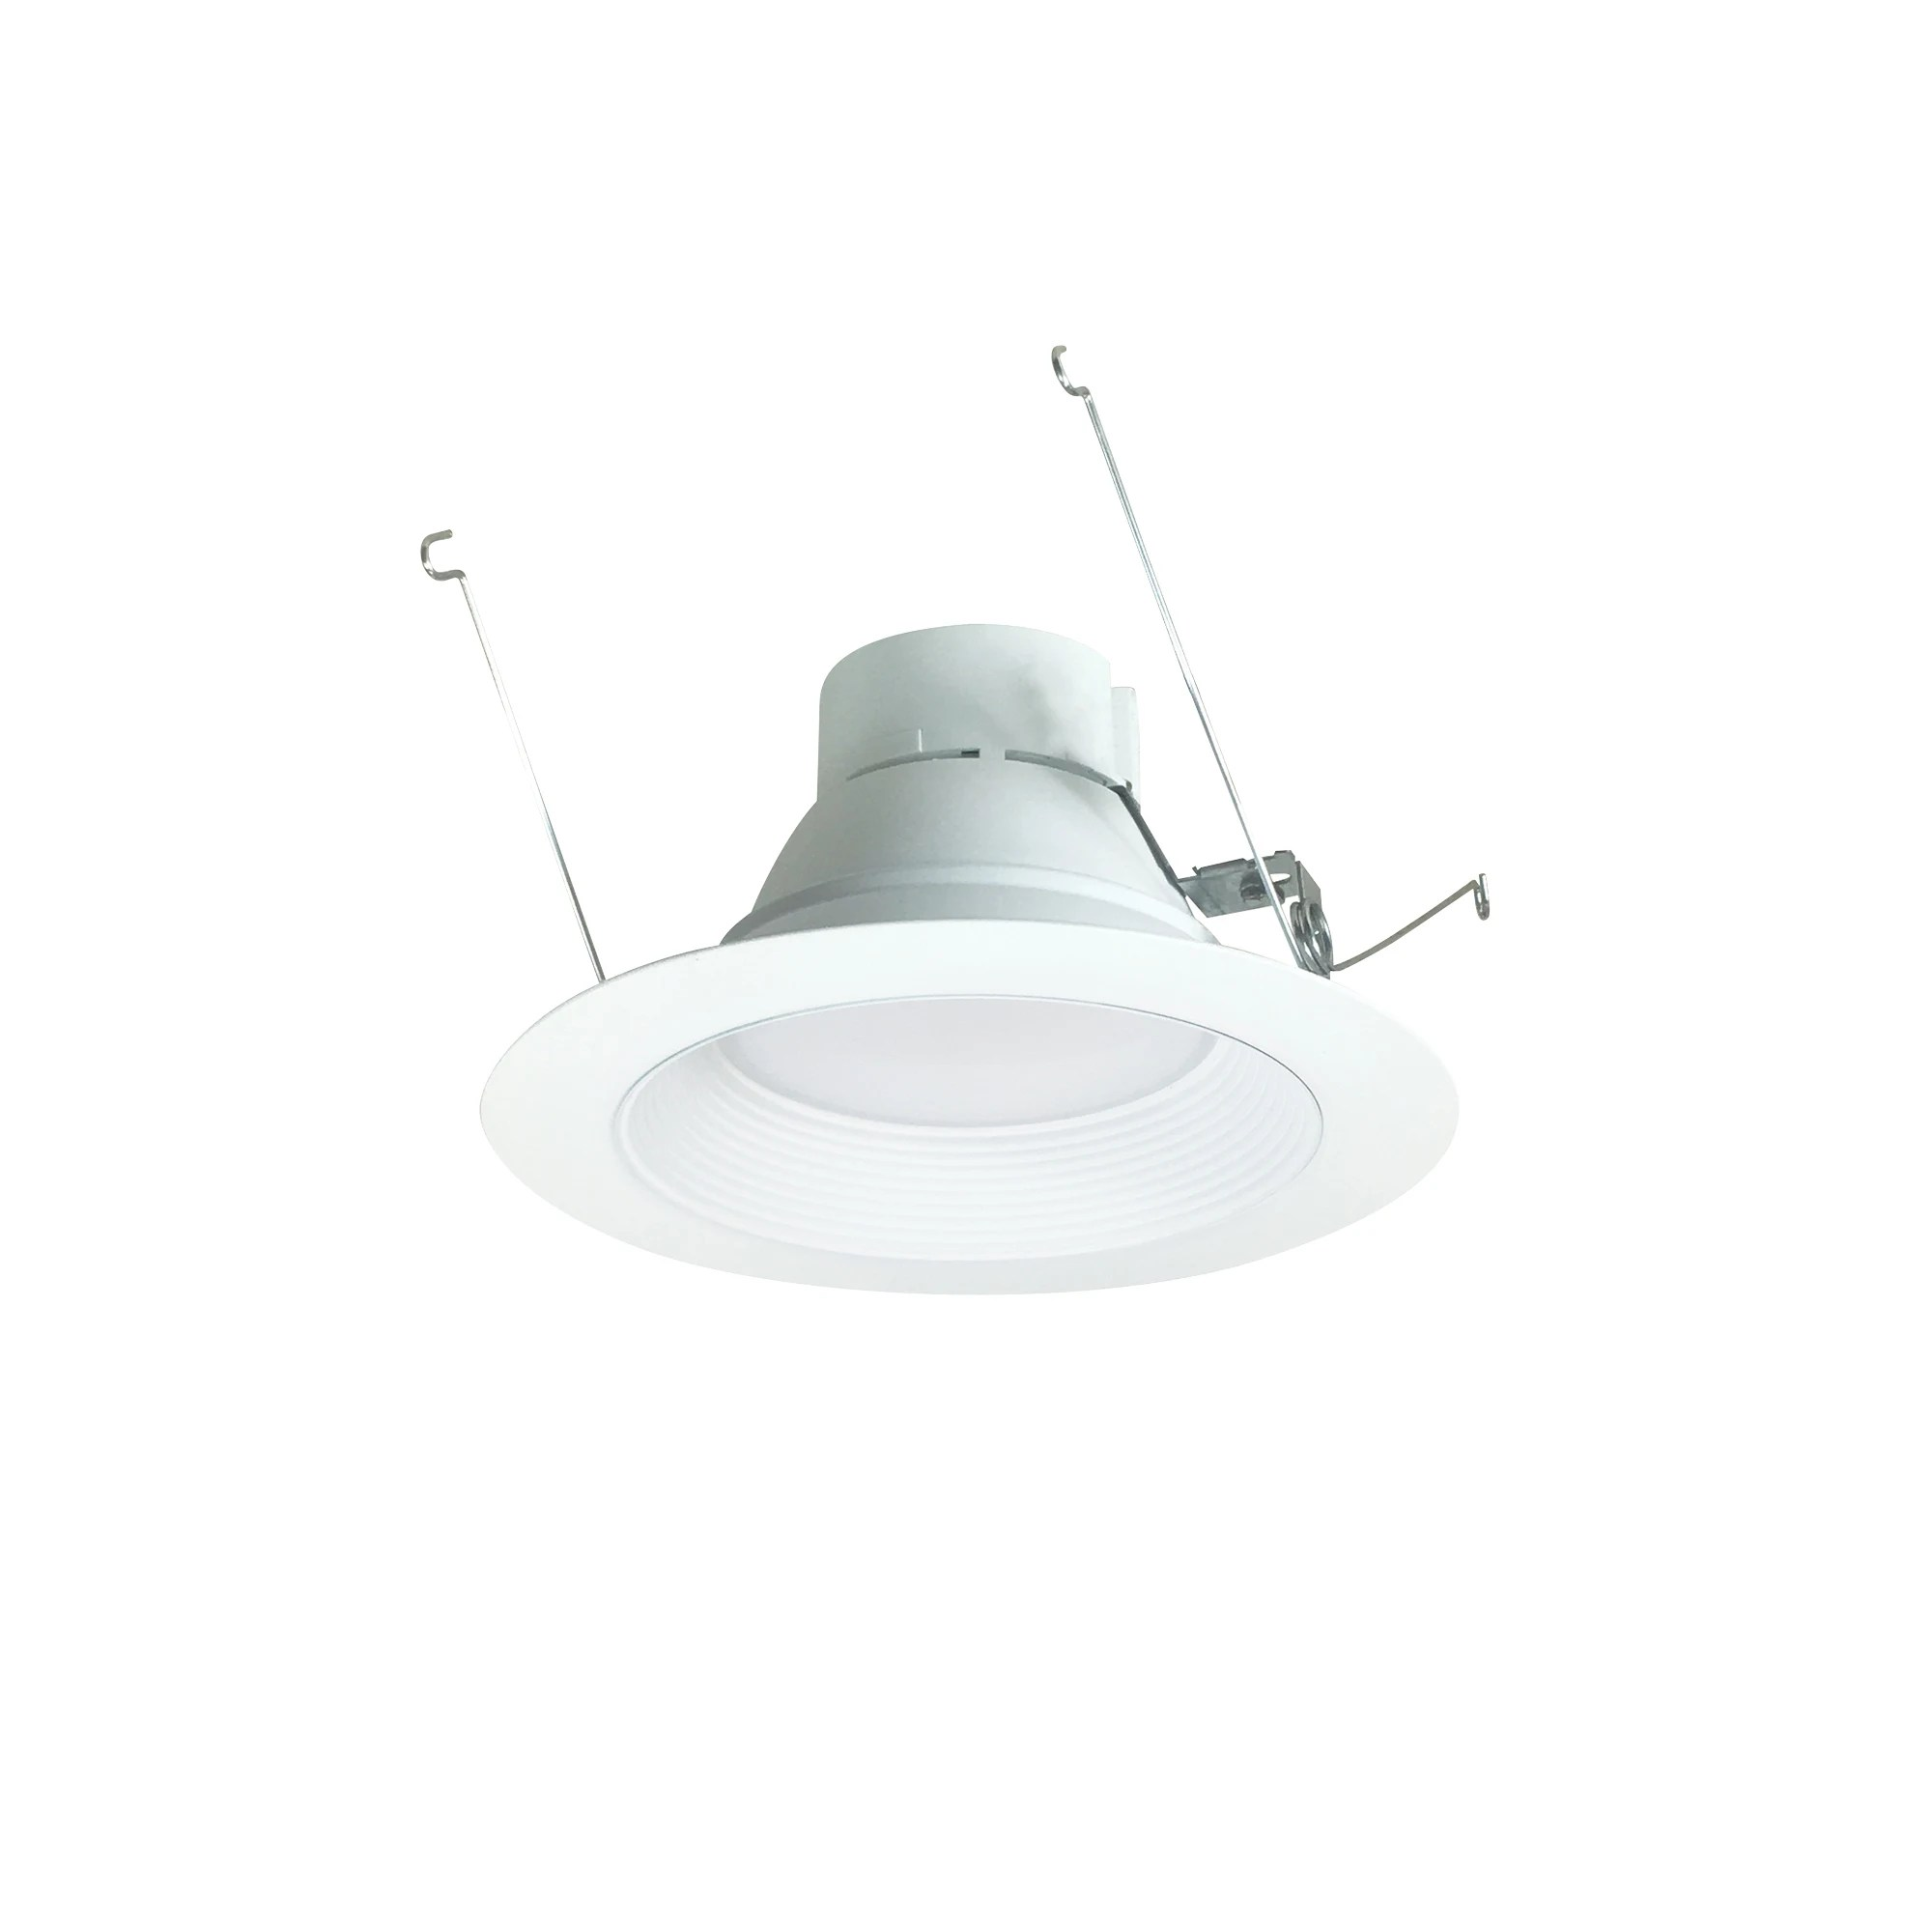 nora lighting noxtw 5632